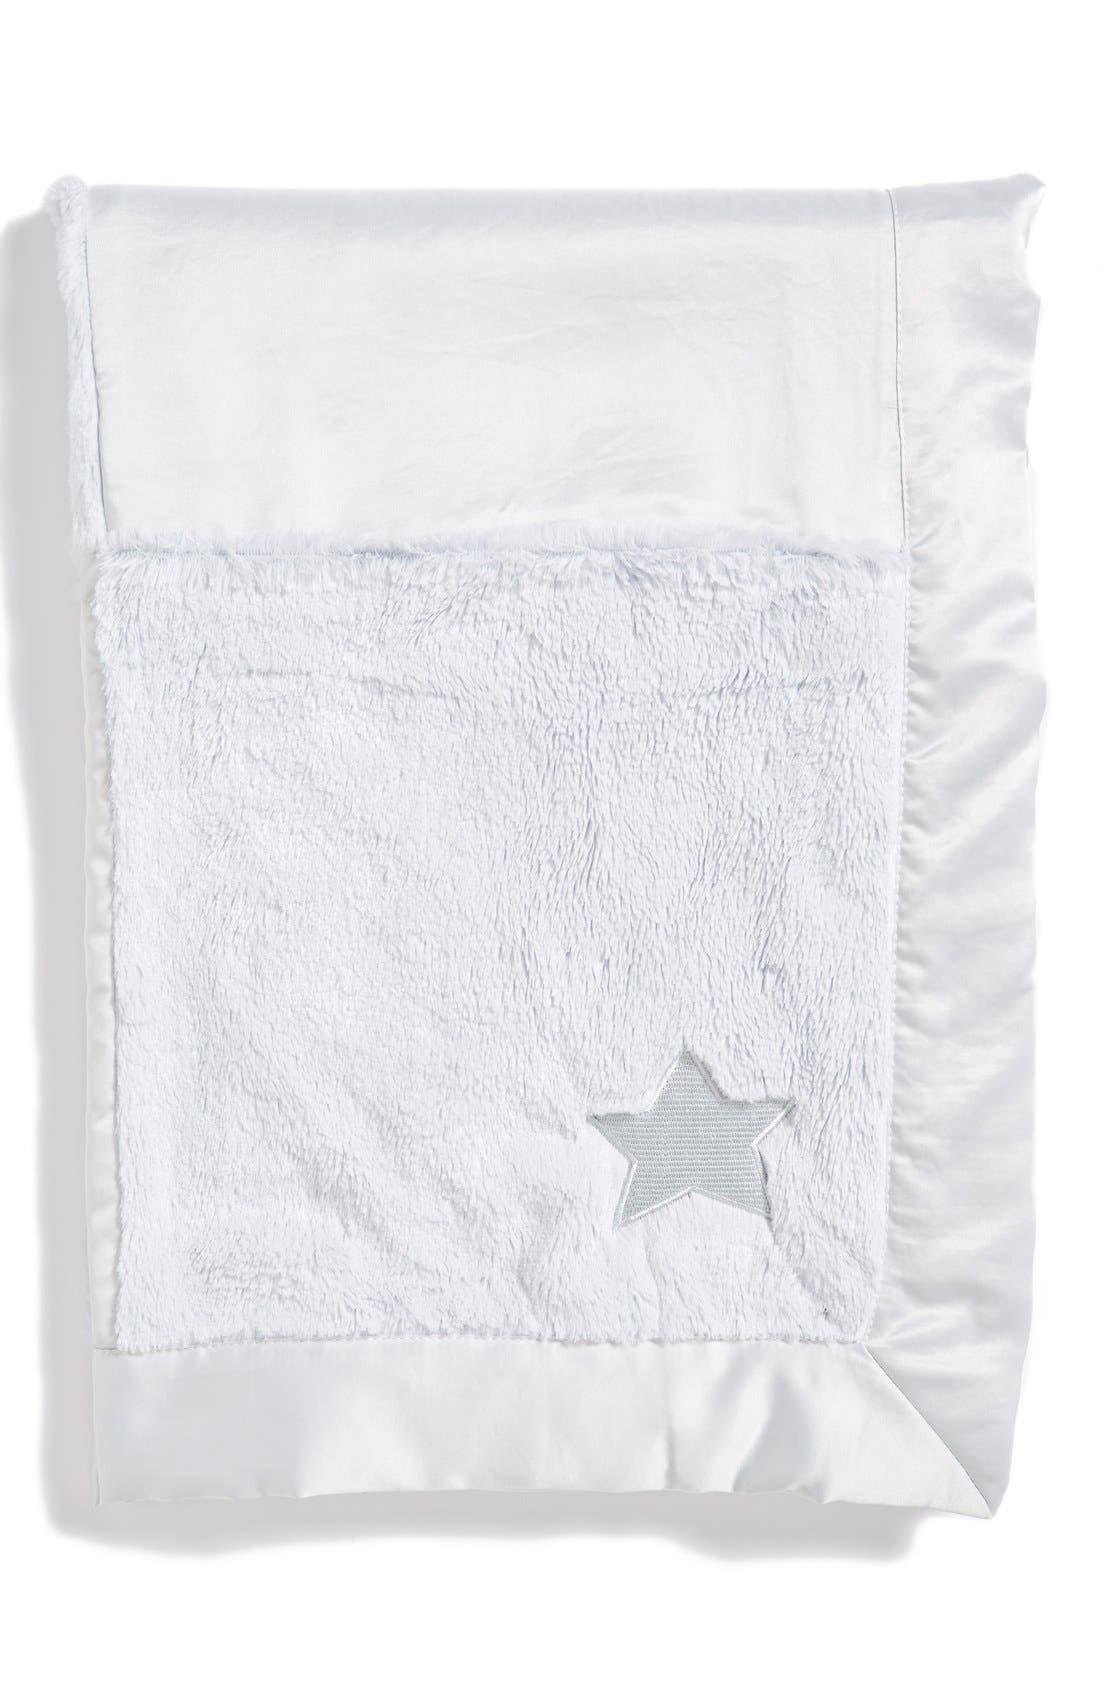 'Cuddle' Patchwork Receiving Blanket,                             Alternate thumbnail 4, color,                             400